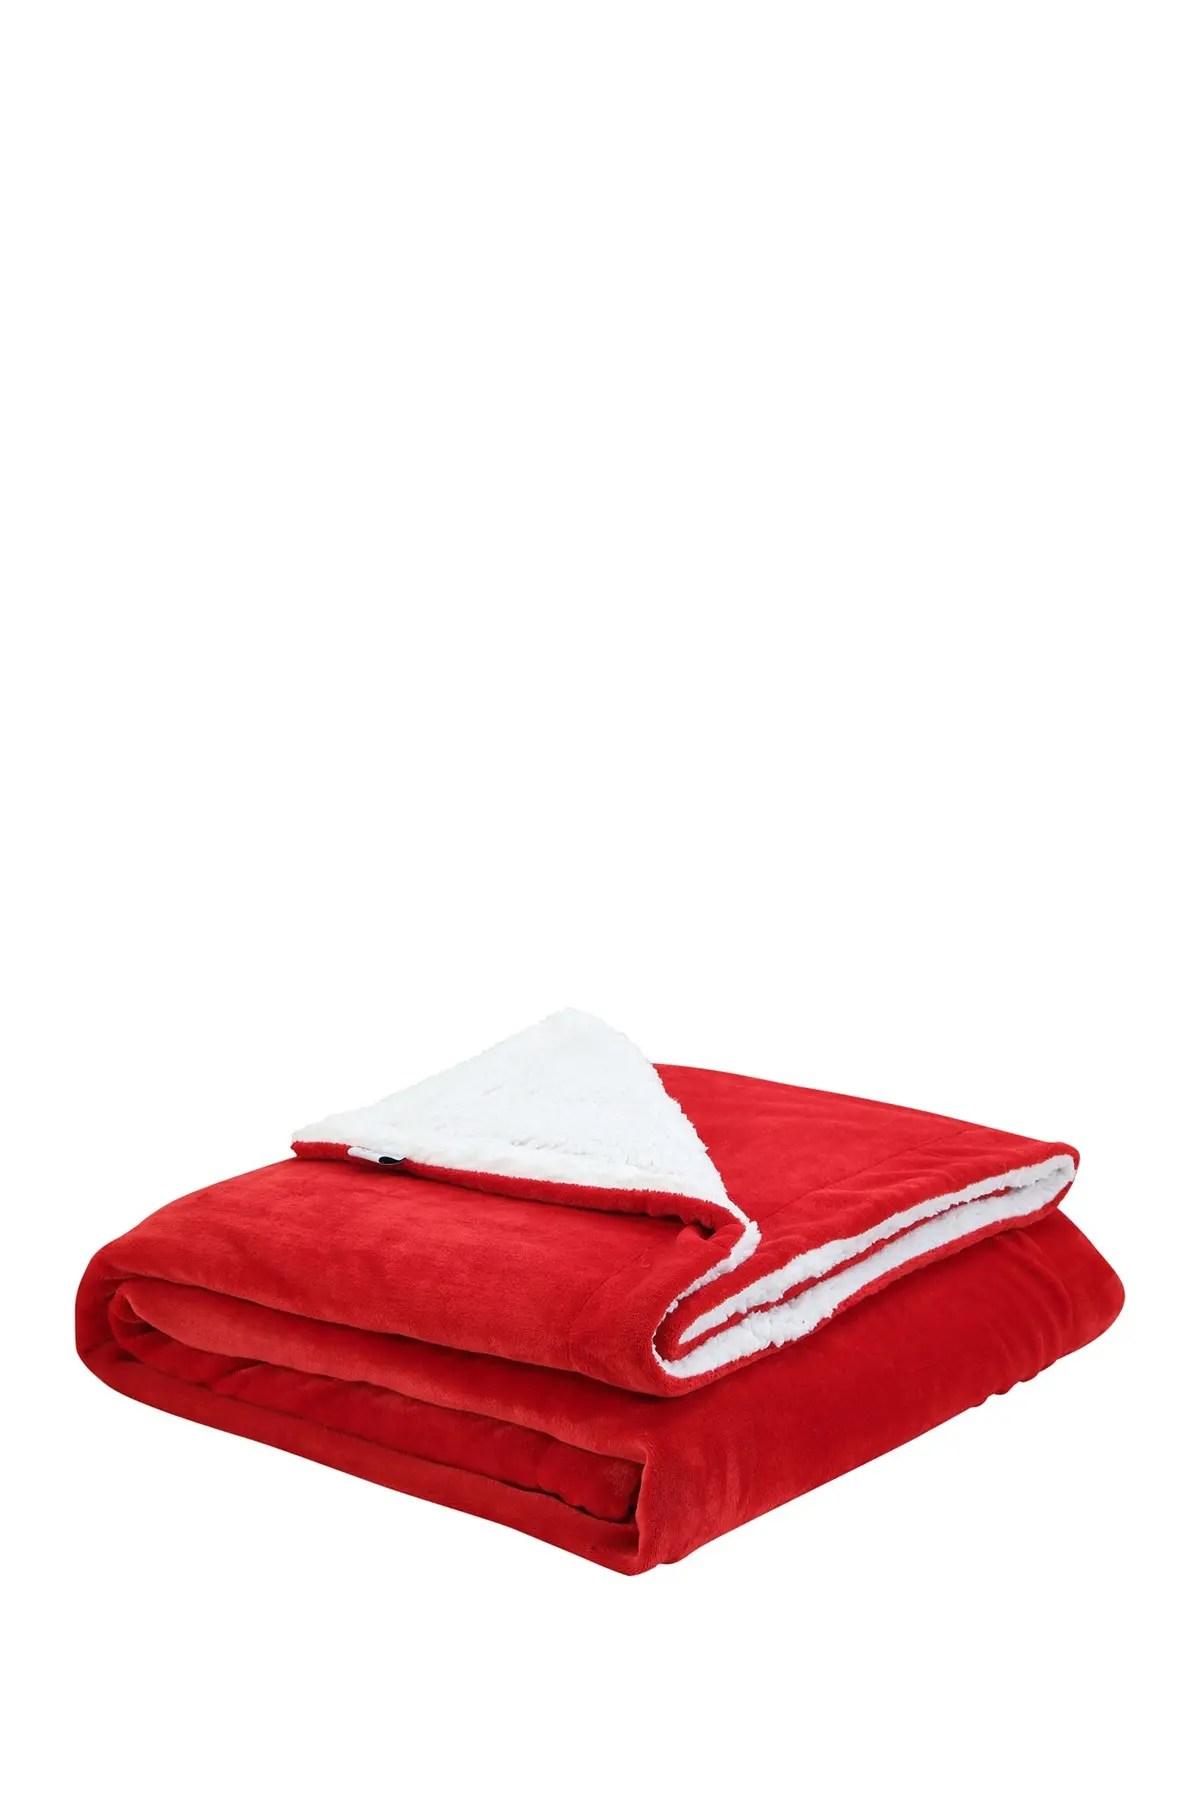 inspired home cozy tyme saleem sherpa throw blanket 108x90 red king nordstrom rack